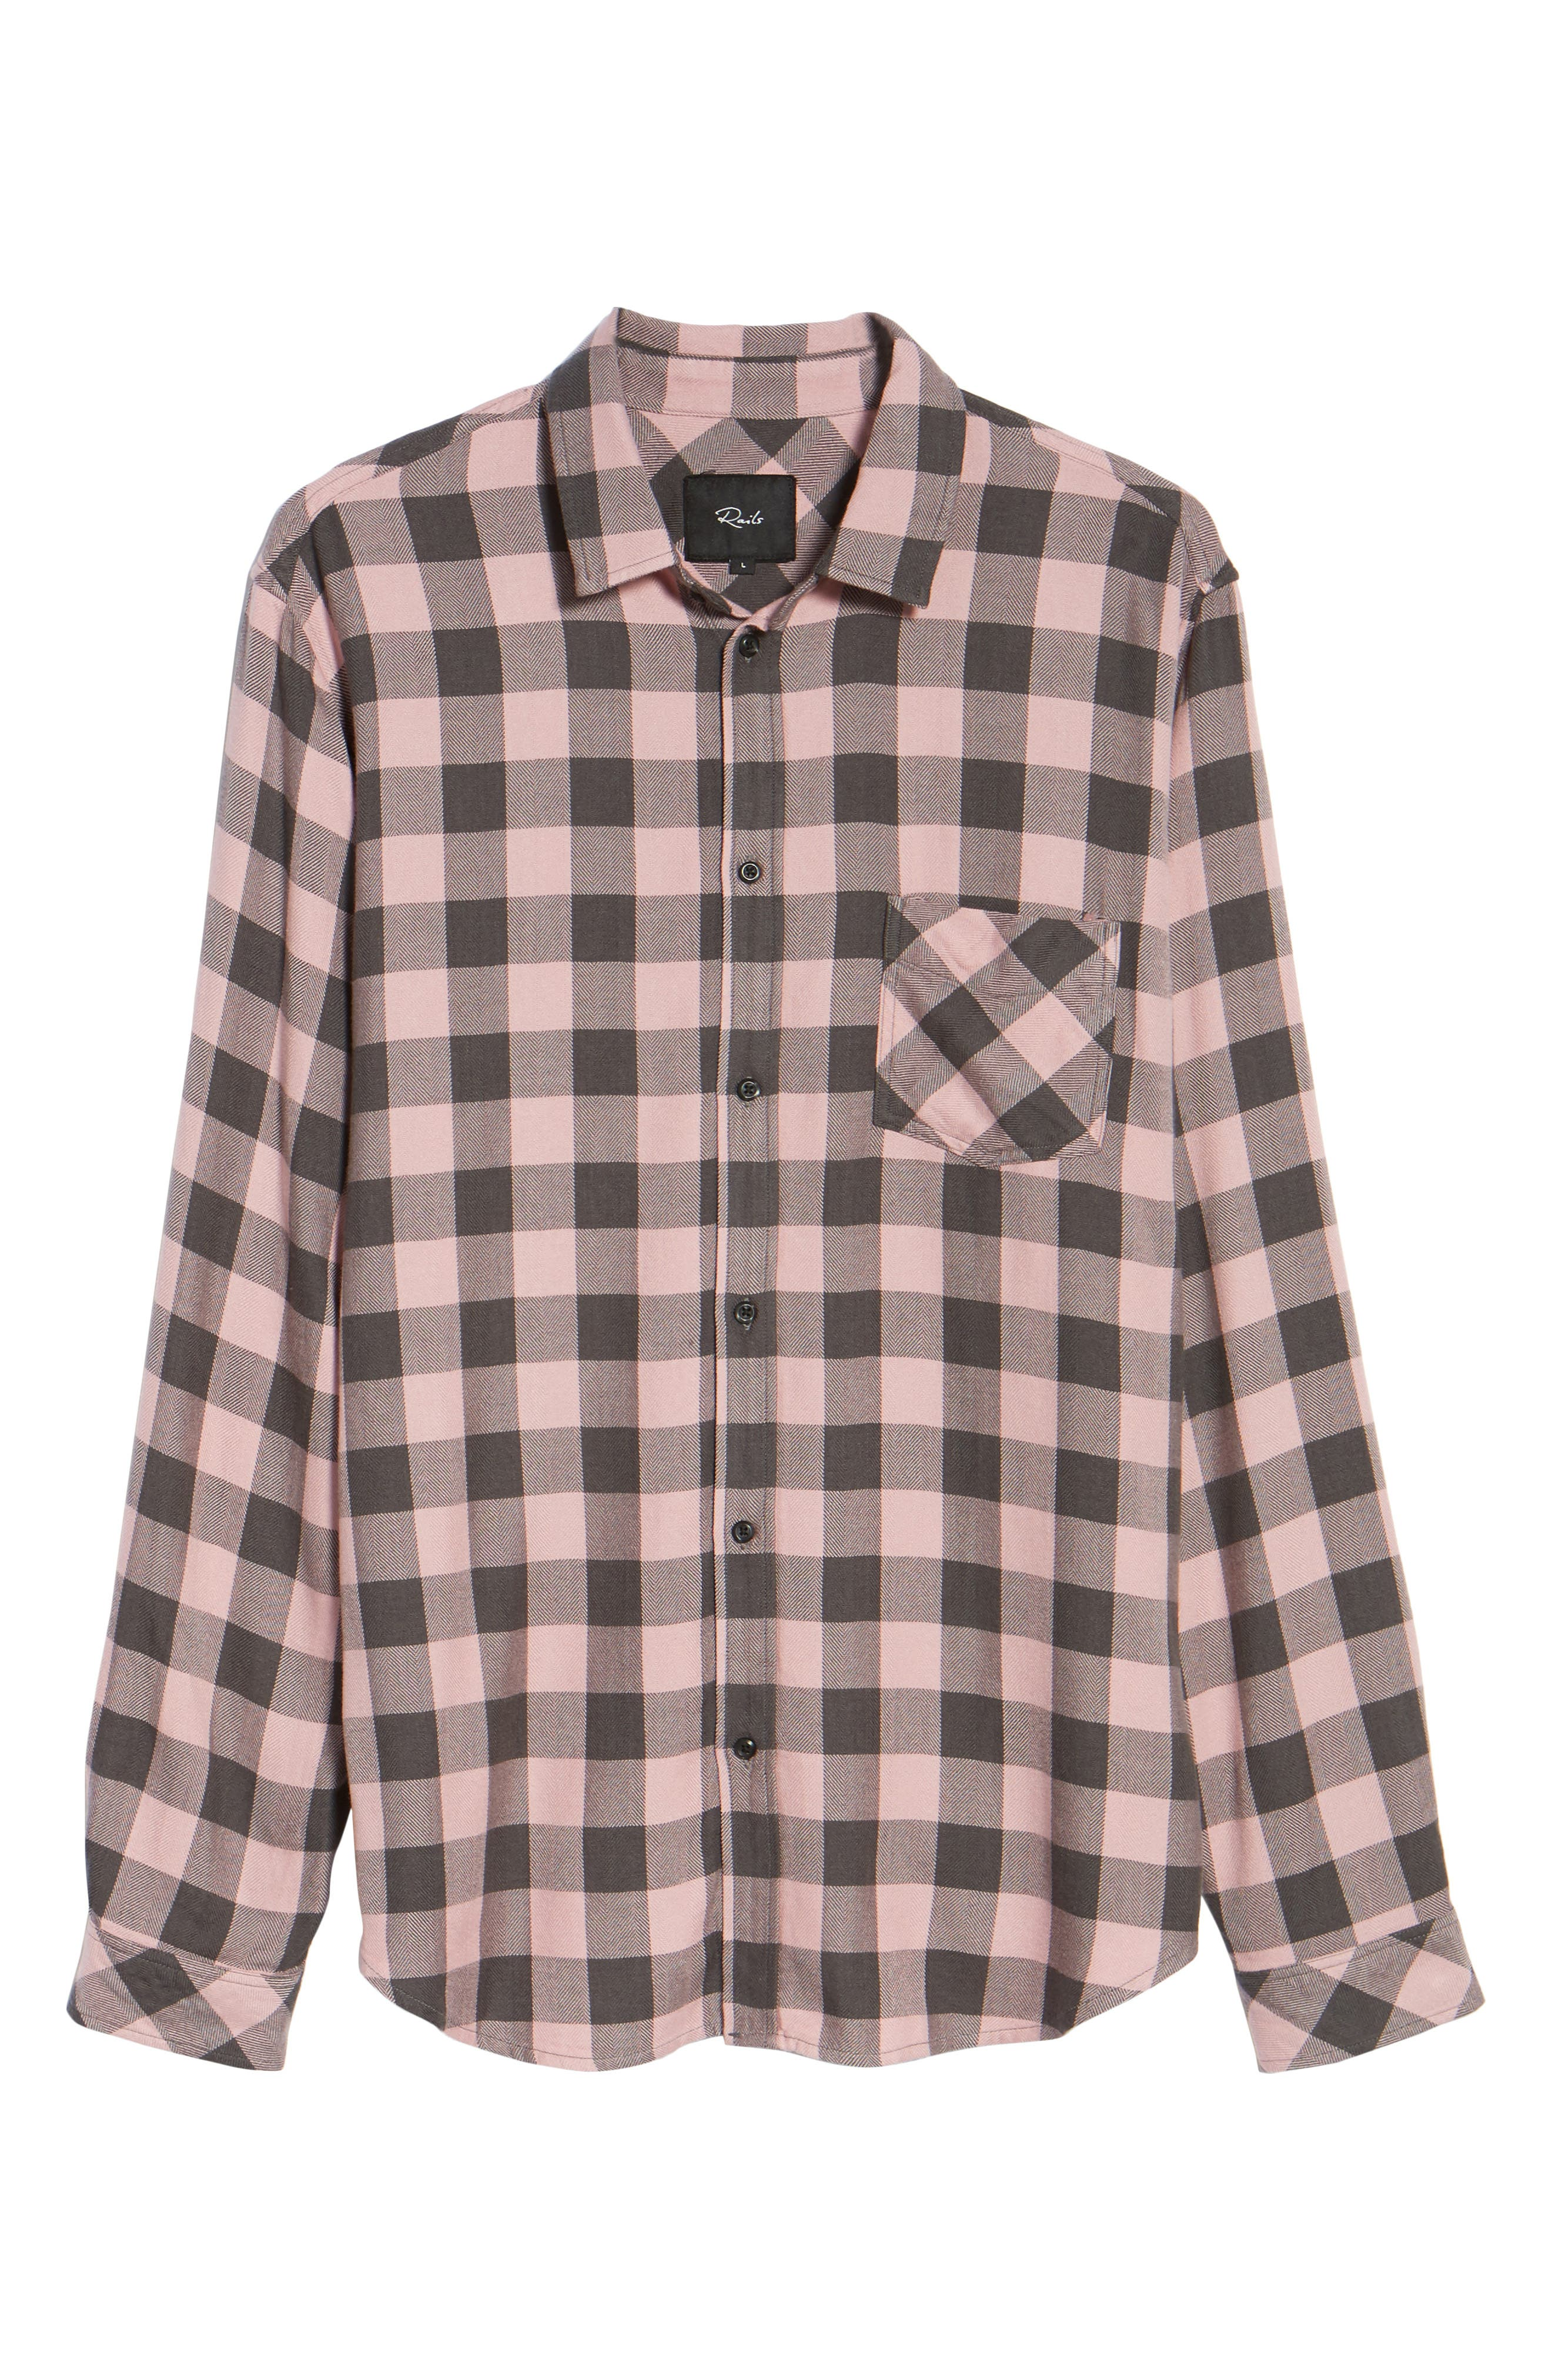 Lennox Sport Shirt,                             Alternate thumbnail 6, color,                             Pale Pink/ Charcoal